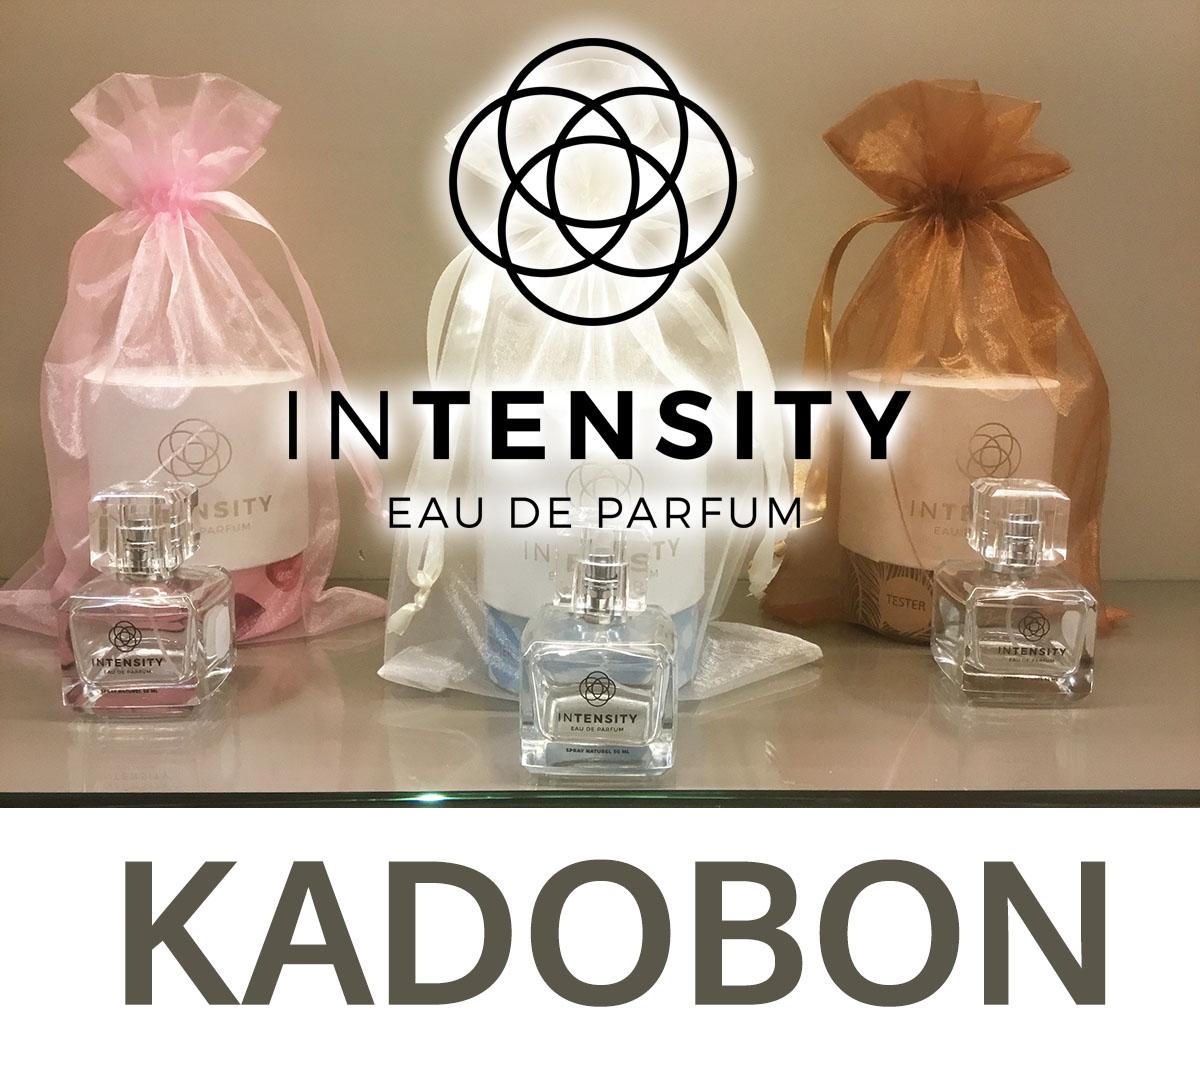 Intensity - Eau De Parfum - KADOBON